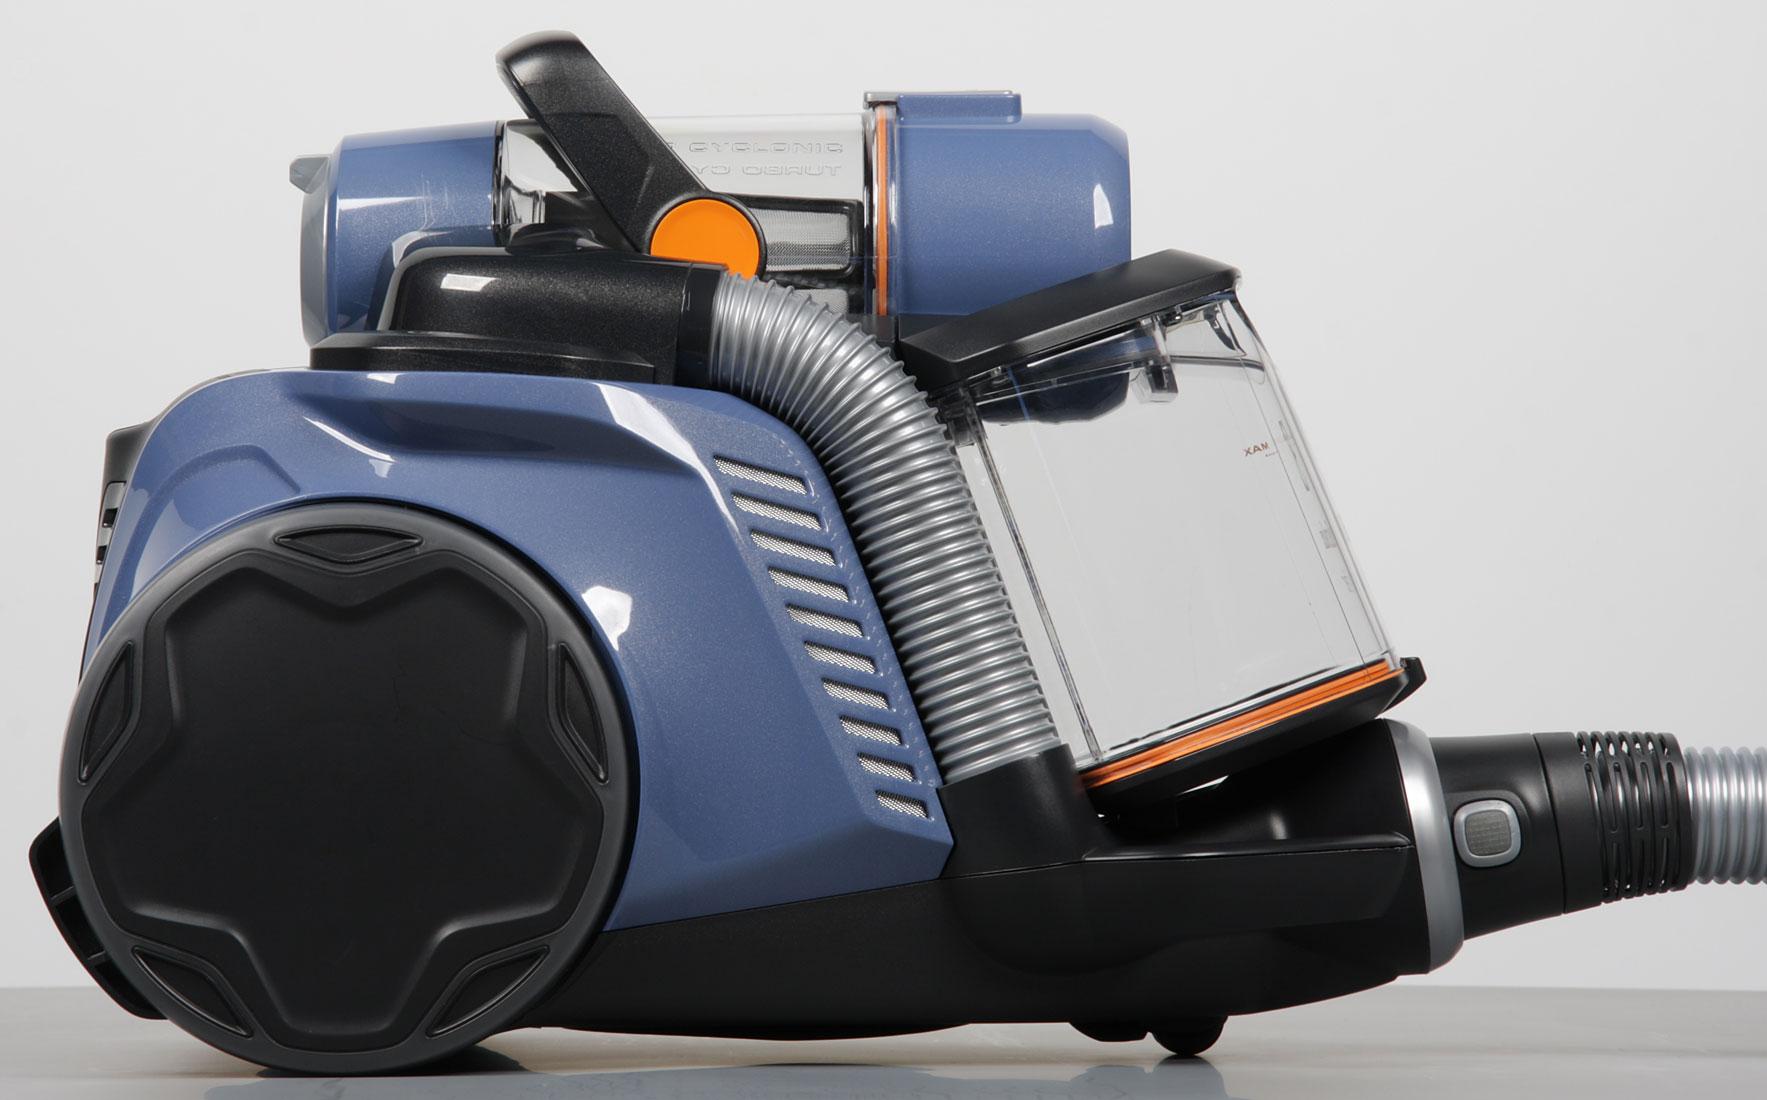 electrolux ultraflex ufflex. Black Bedroom Furniture Sets. Home Design Ideas